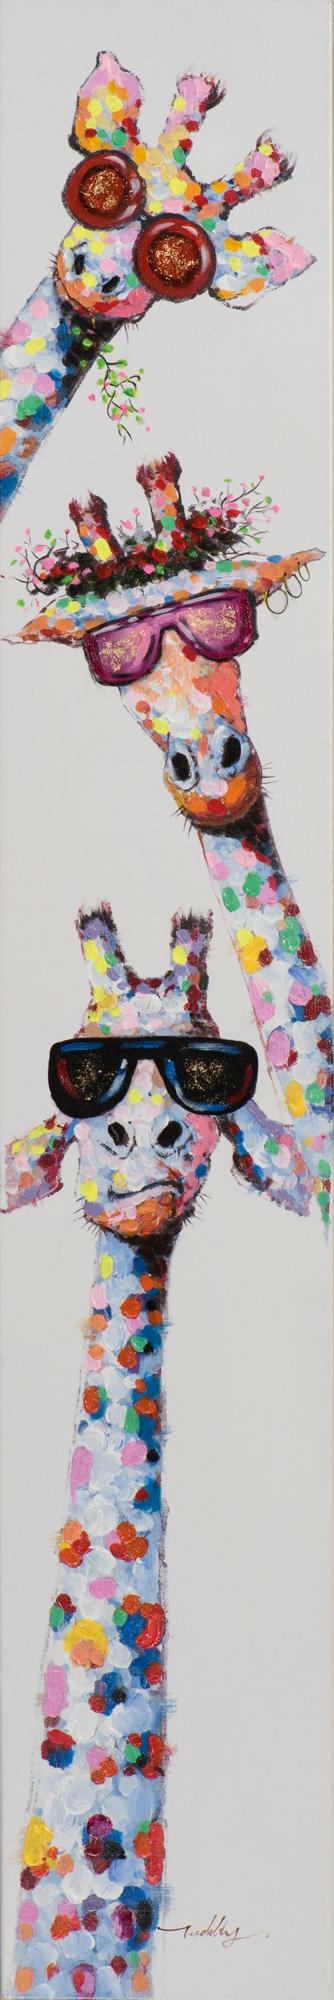 schilderij giraffen 25x150